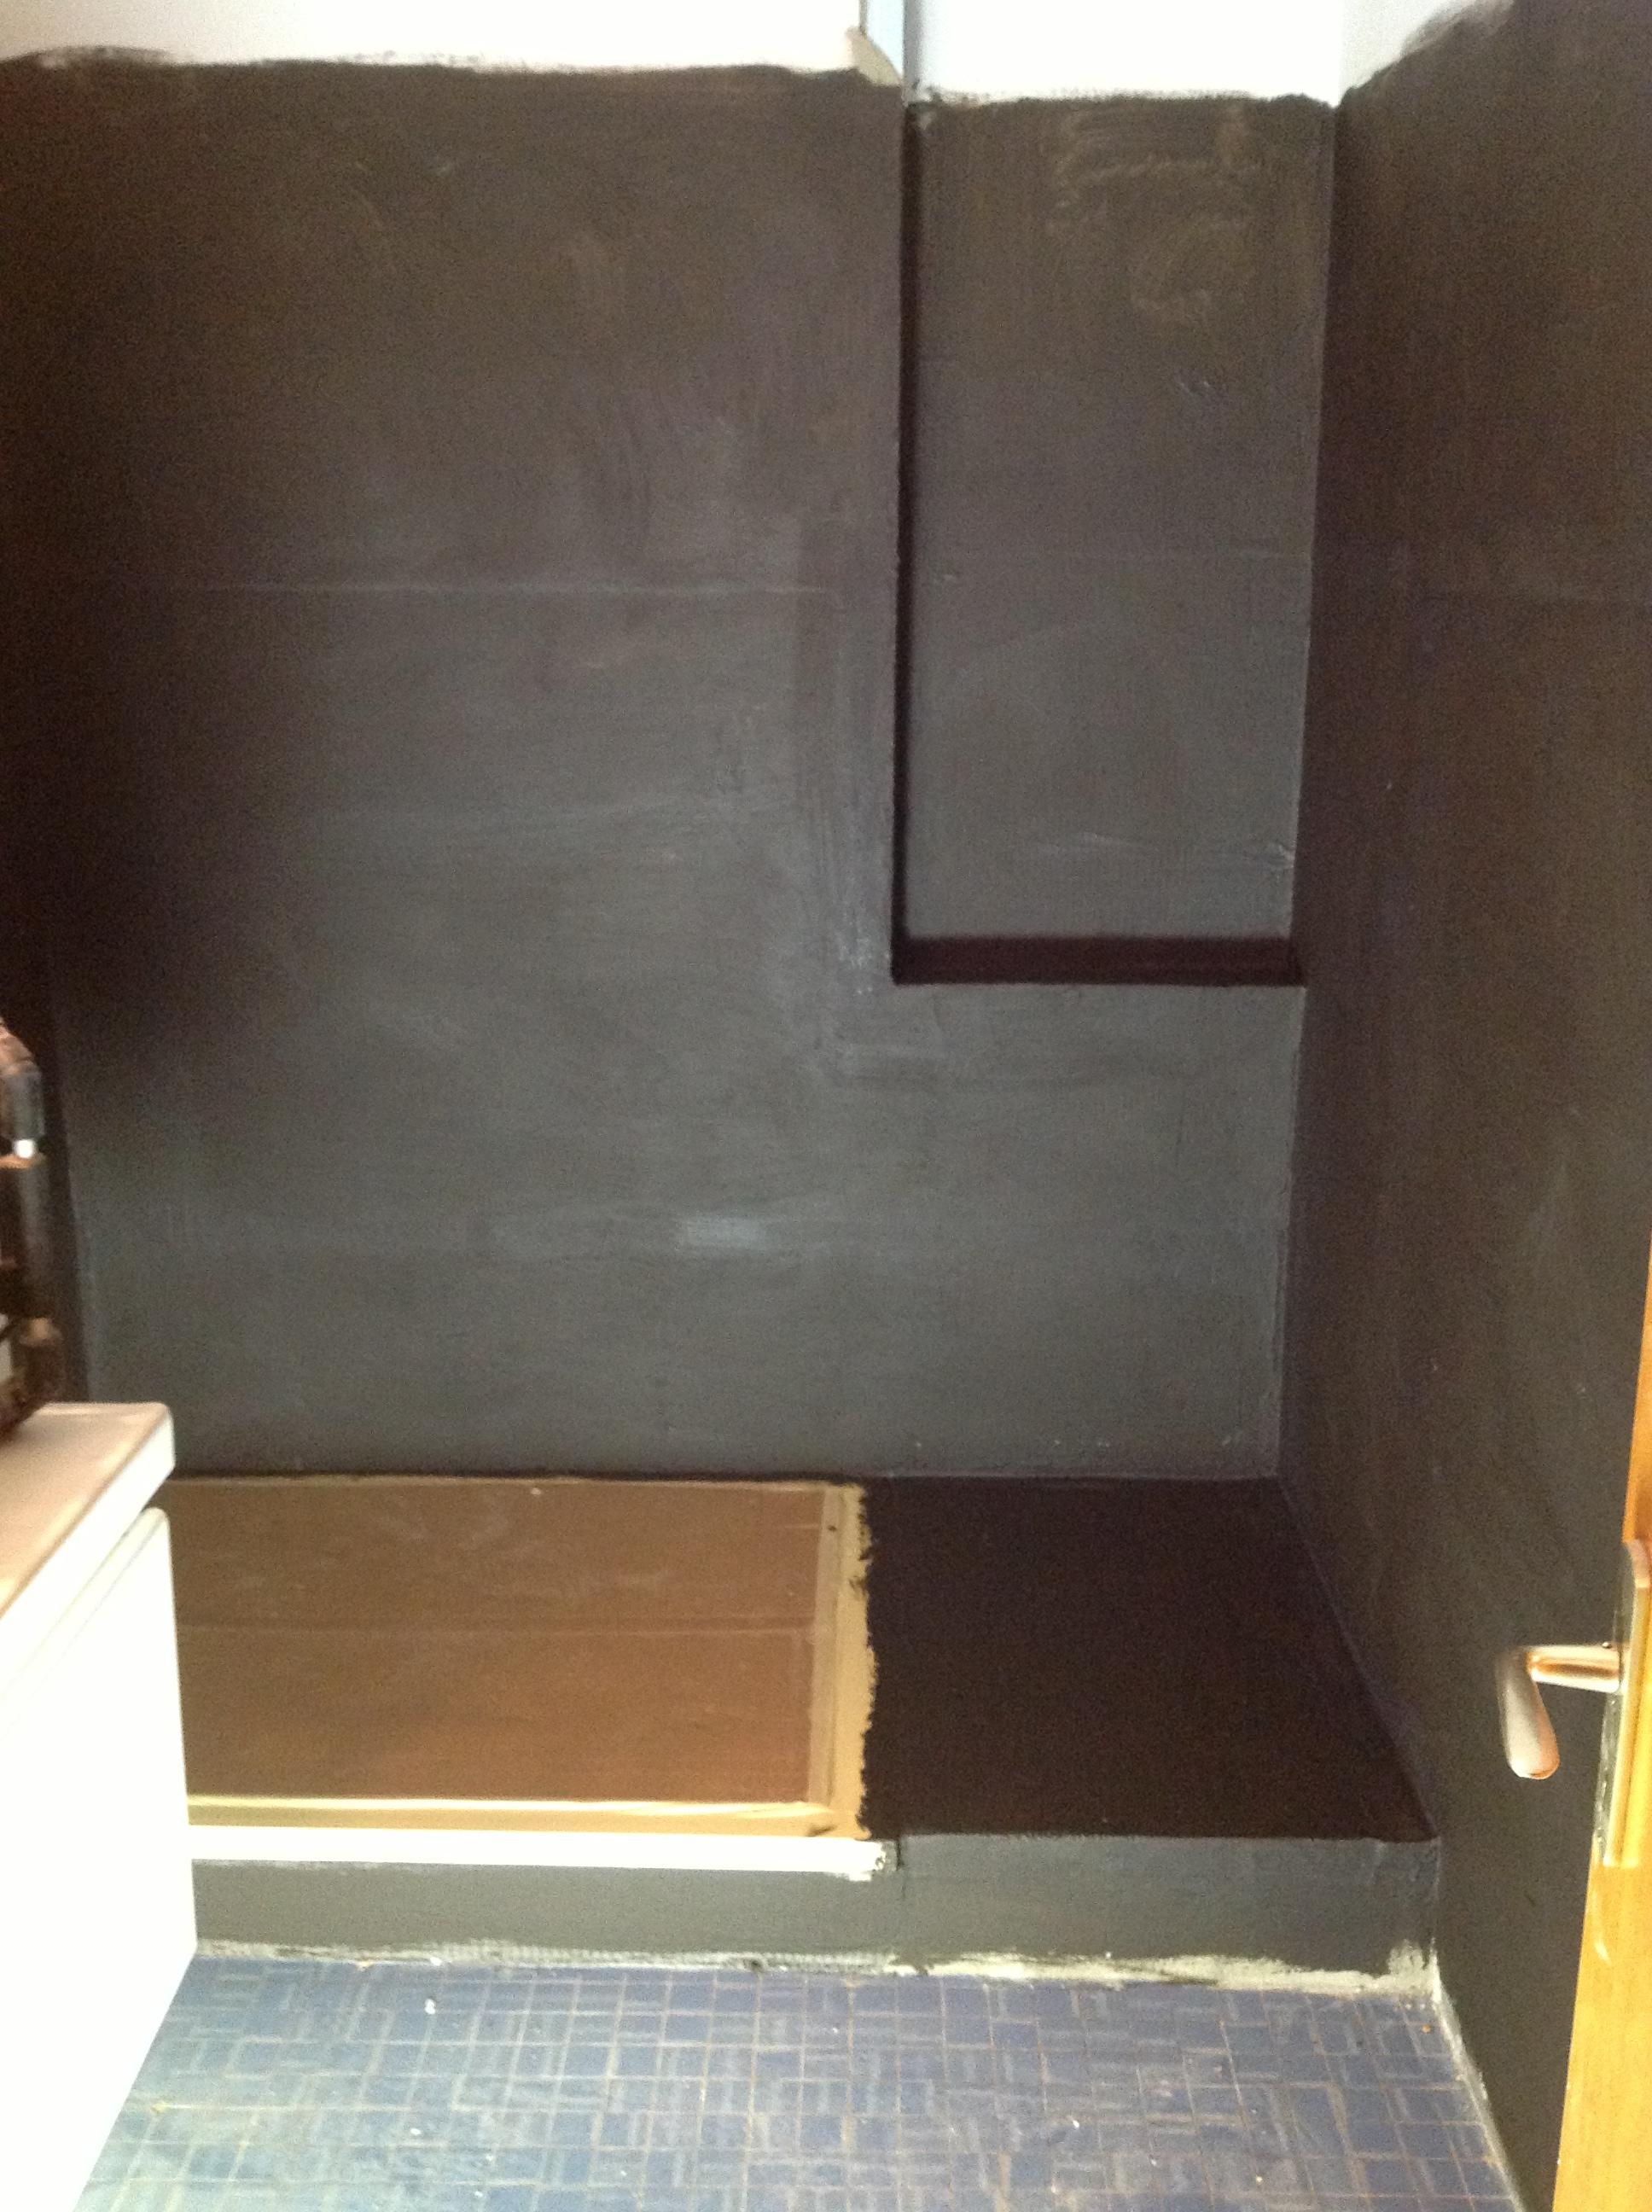 Etancheite sous carrelage salle de bain etancheite sous for Etancheite sous carrelage